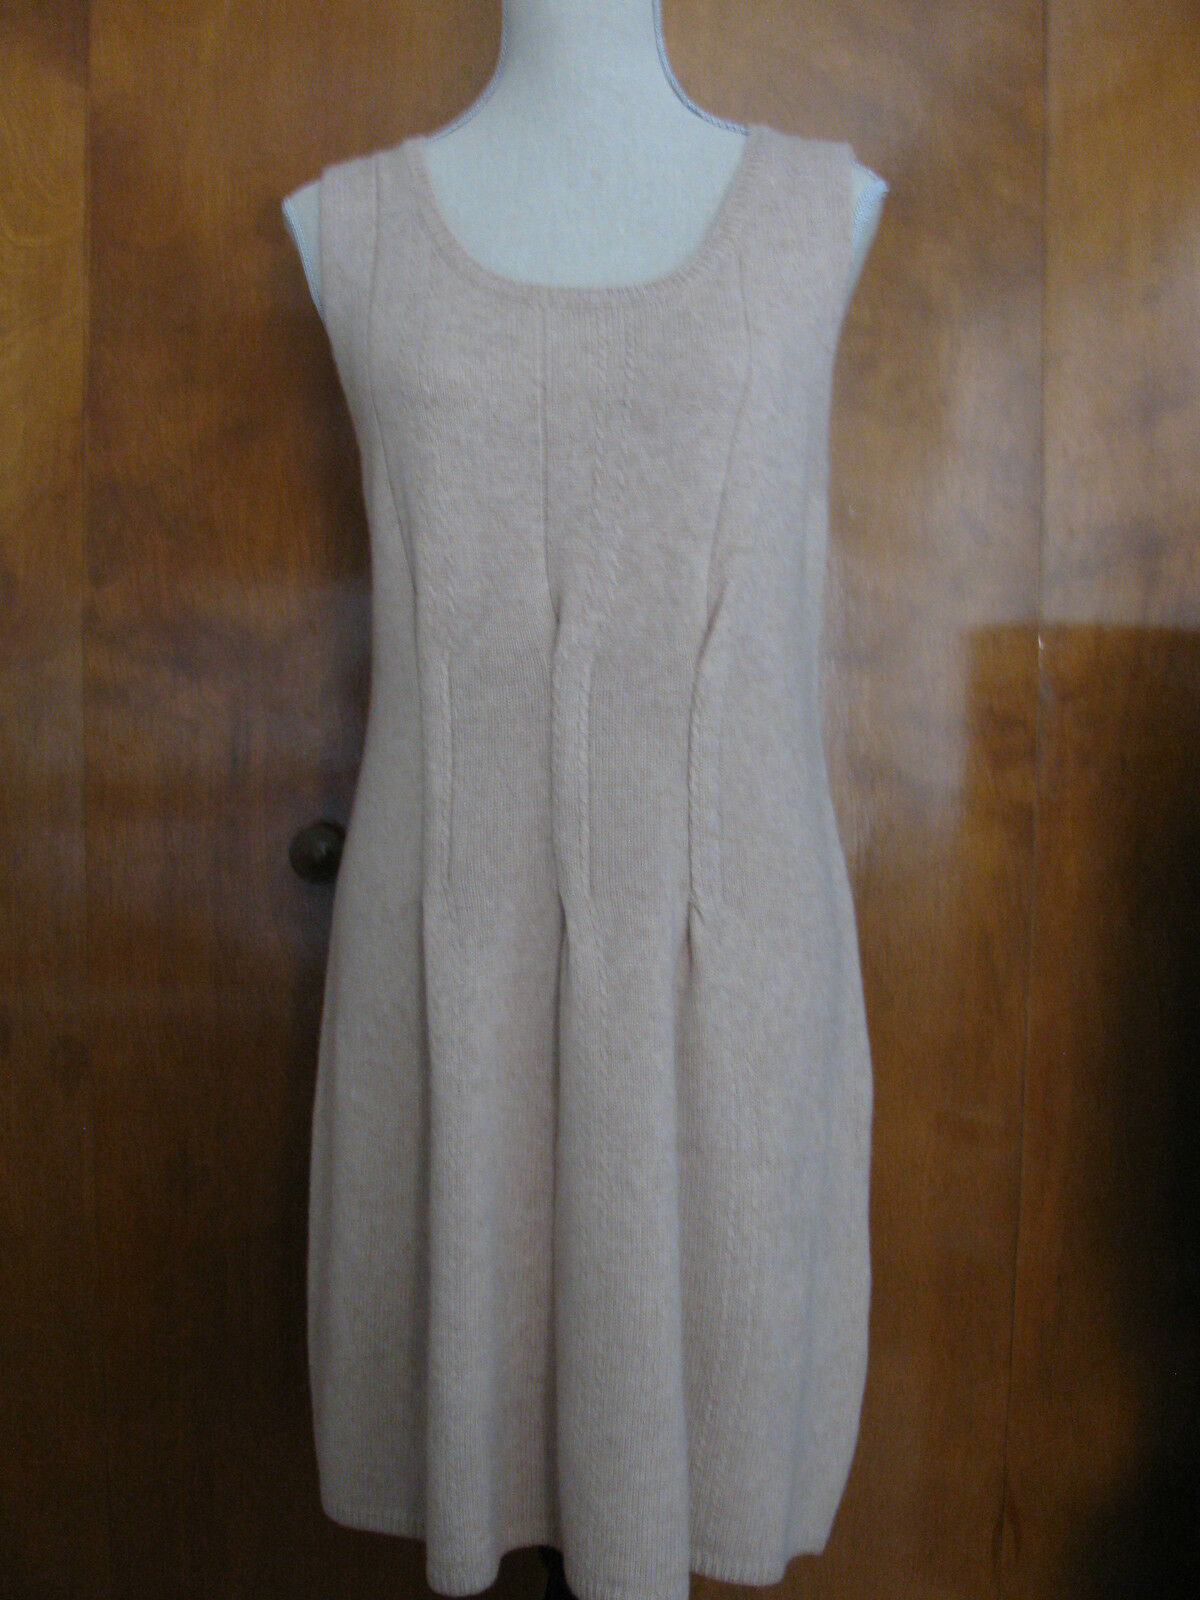 Sutton Studio women's ivory wool cashmere detailed sleeveless dress Large